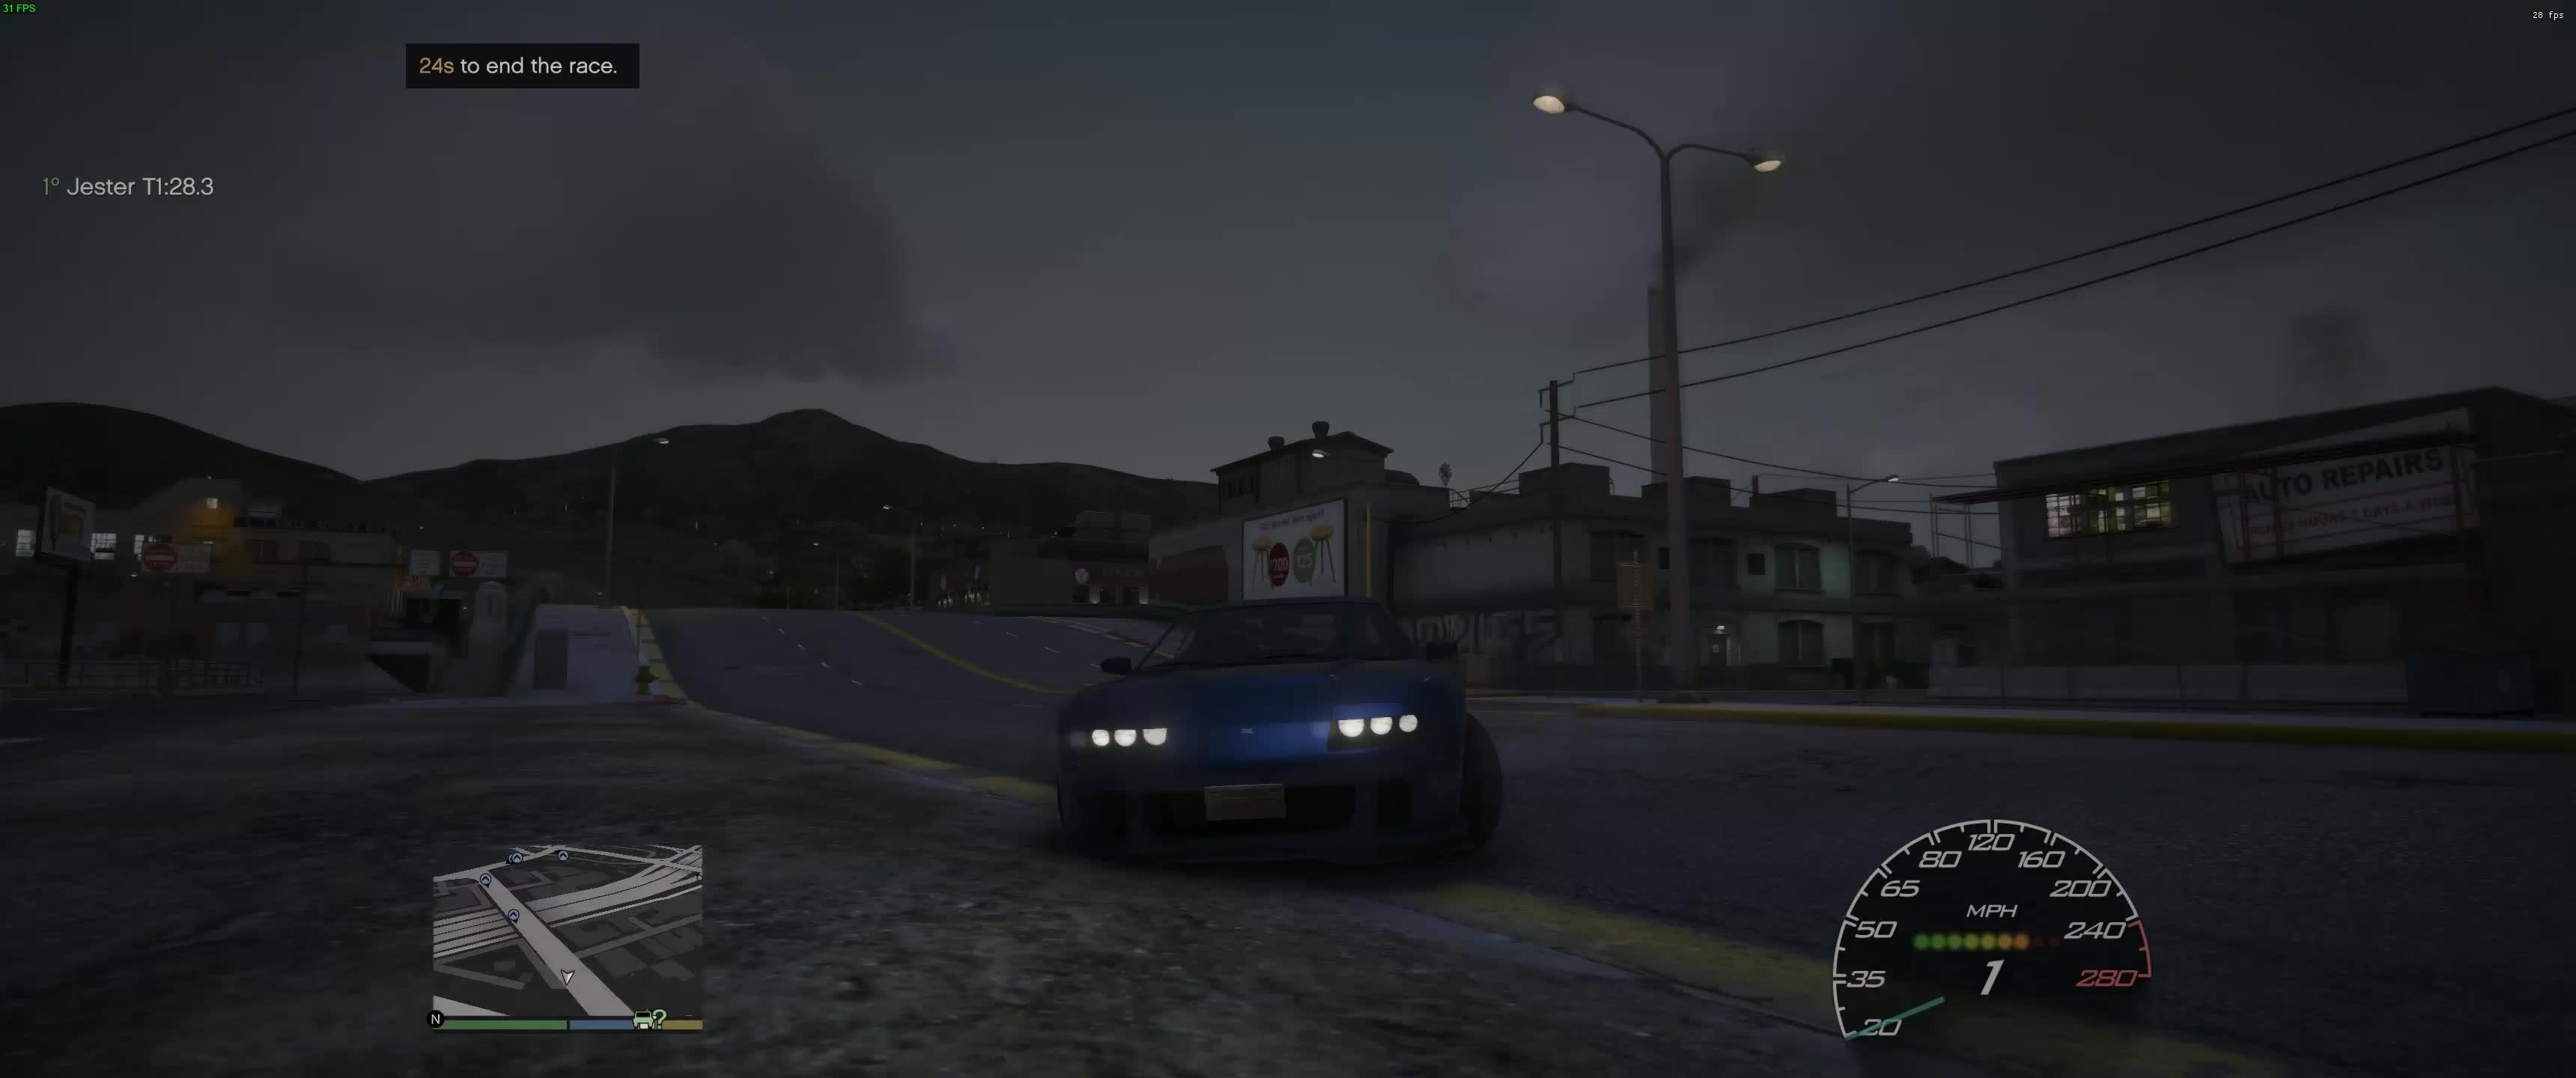 grandtheftautov, Grand Theft Auto V 2019.08.09 - 23.41.58.04.DVR GIFs